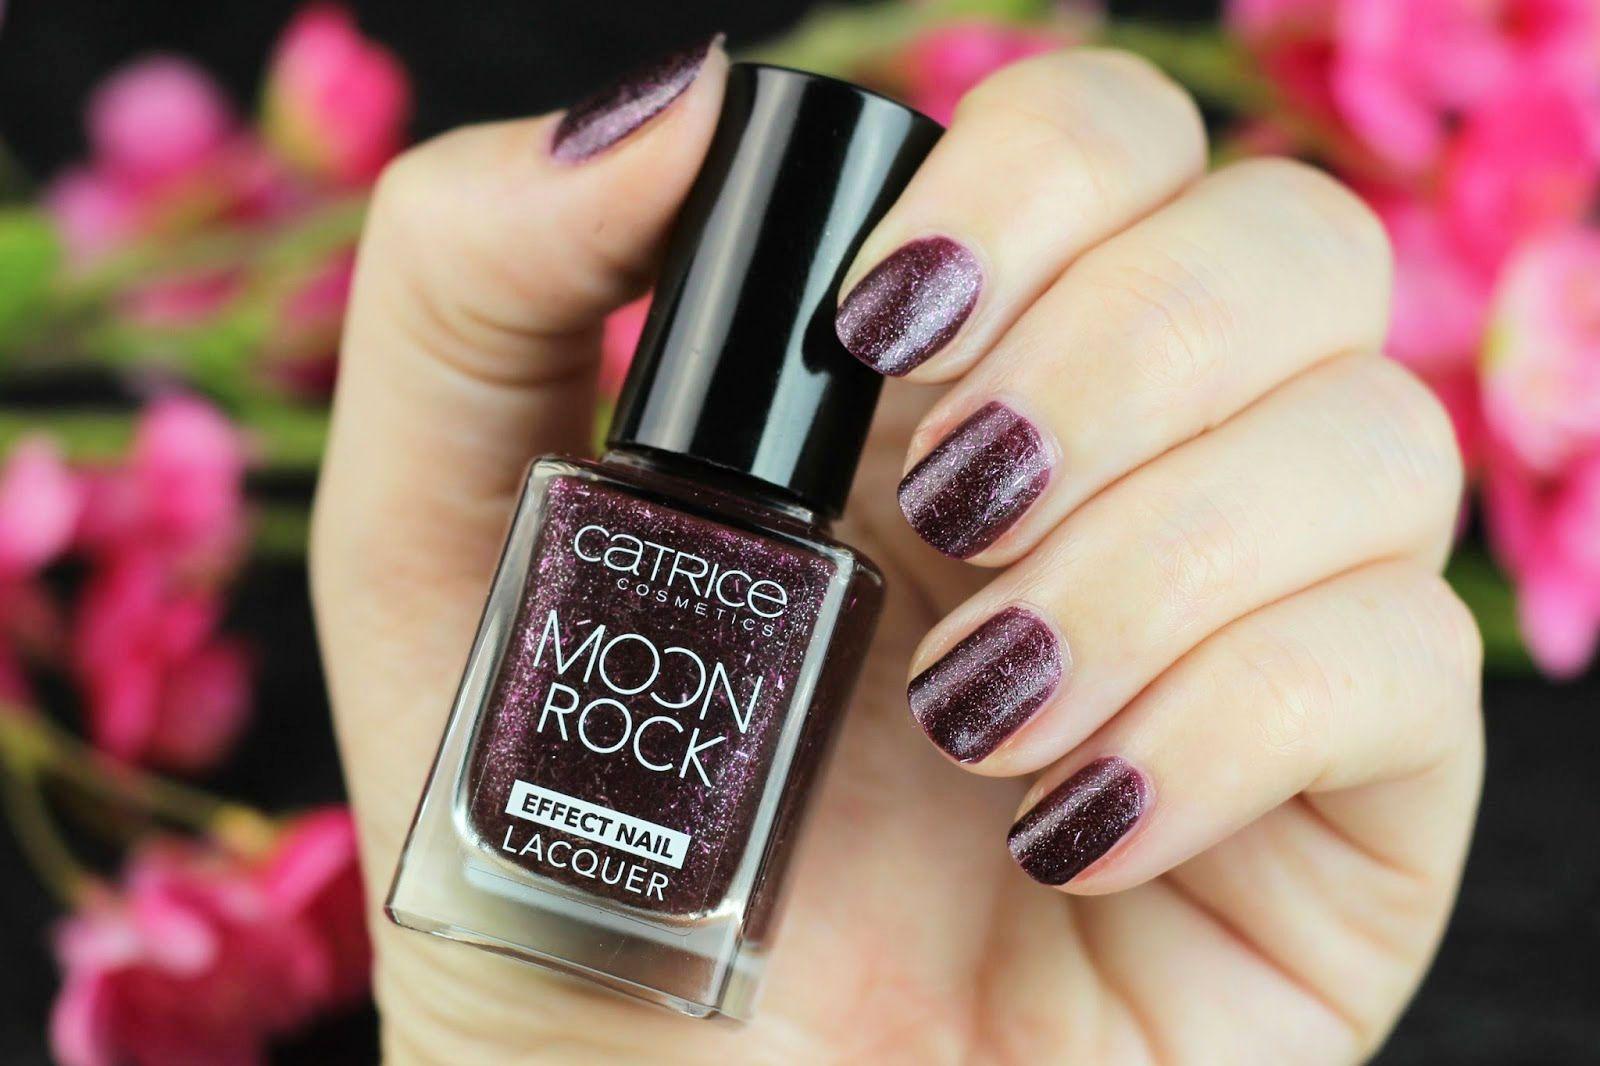 Catrice Moon Rock Effect Nail Lacquer #catrice #nagellack #beauty #nailpolish #cosmetics